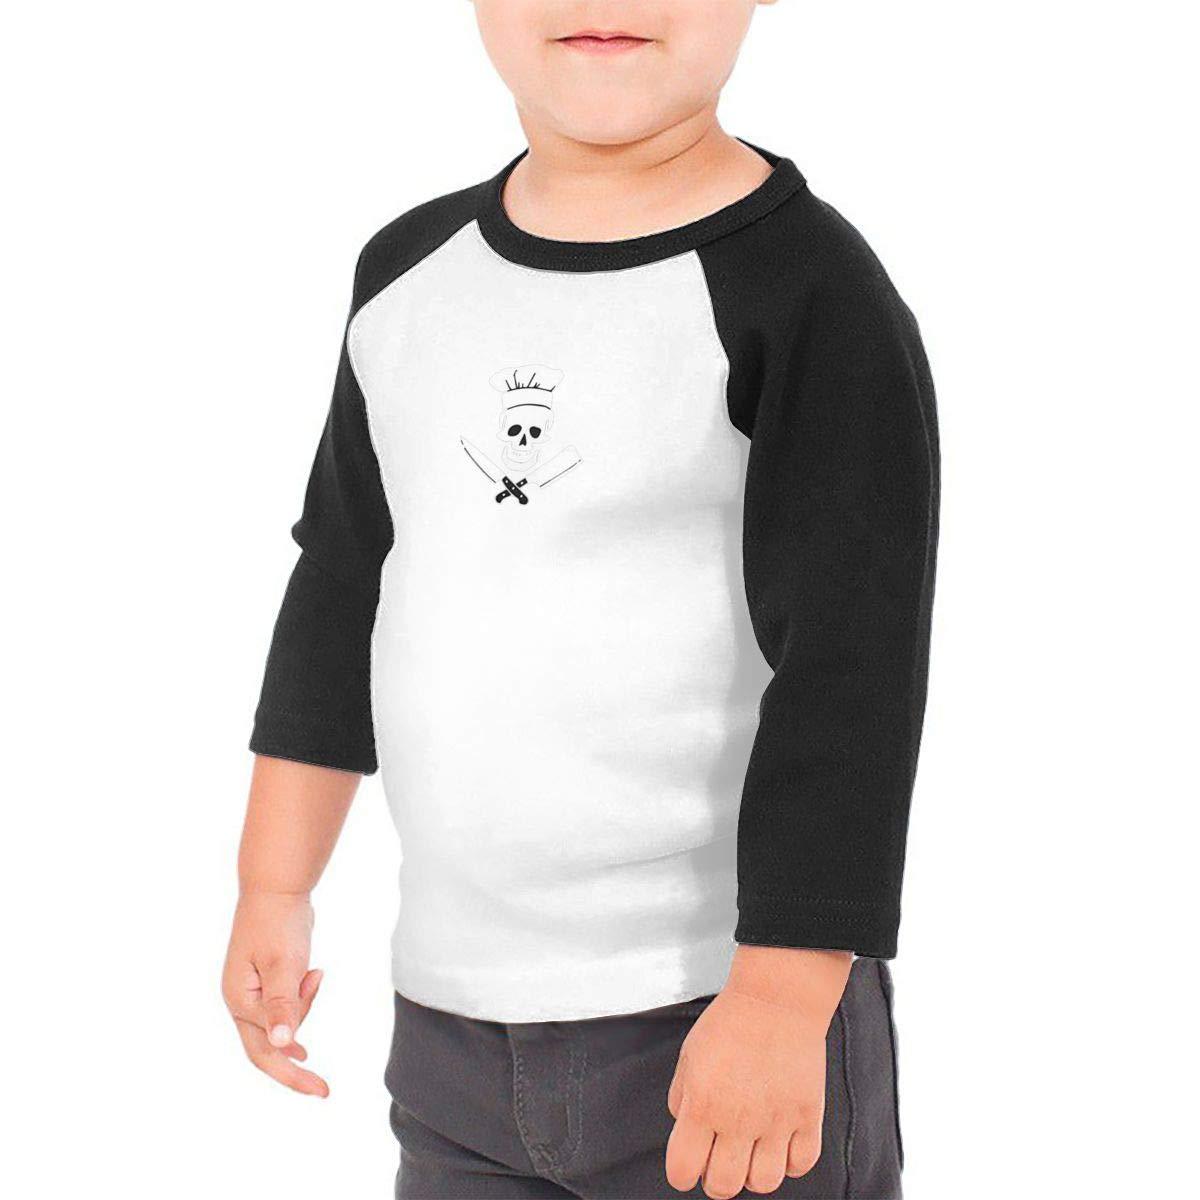 yimo Cooking Skull Unisex Toddler Baseball Jersey Contrast 3//4 Sleeves Tee